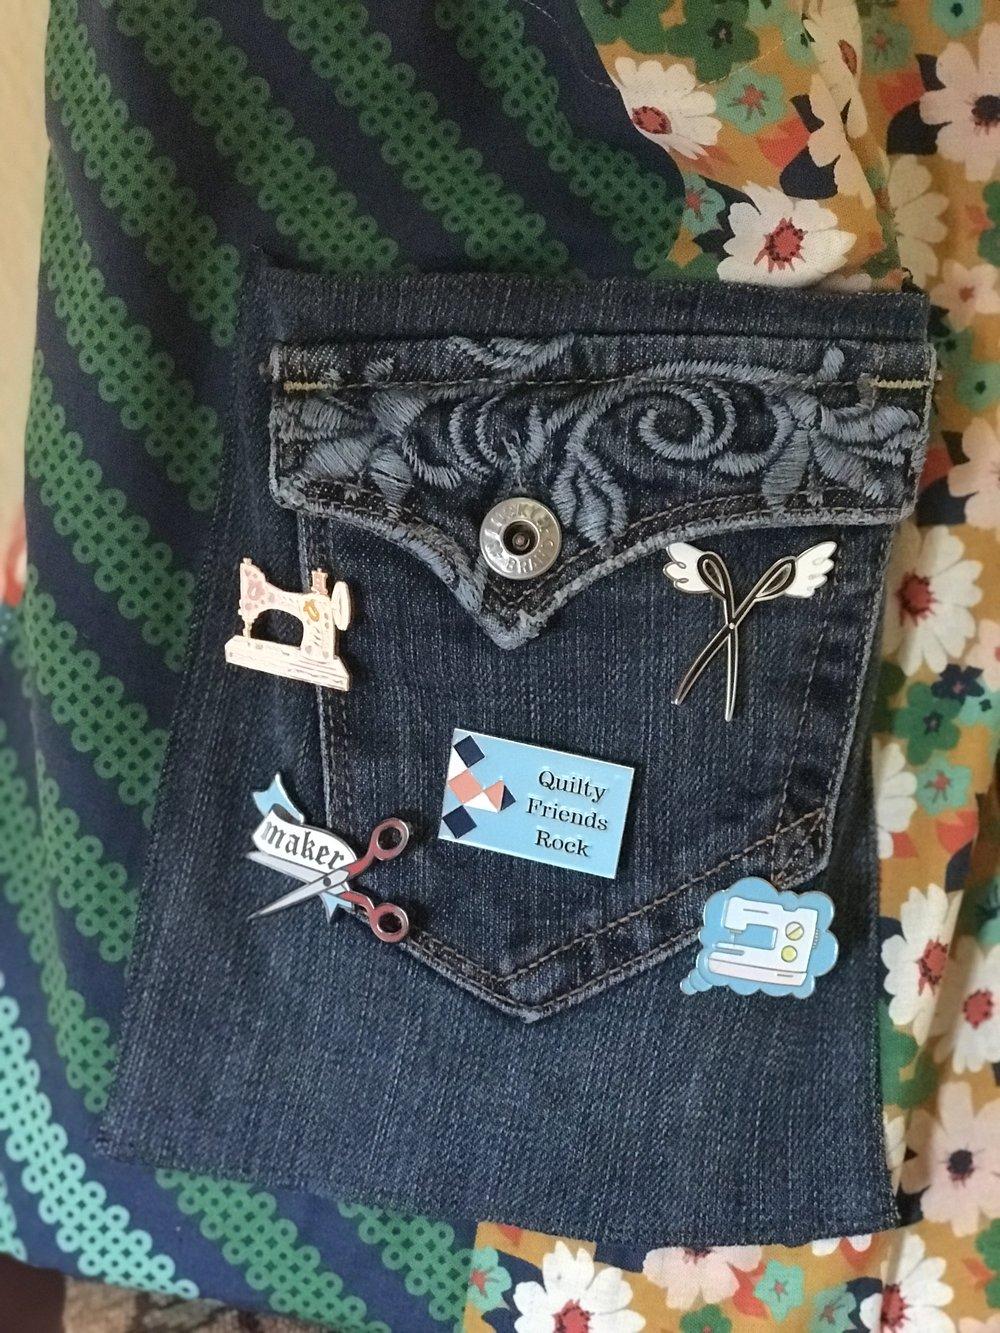 Love the upcycled denim pocket